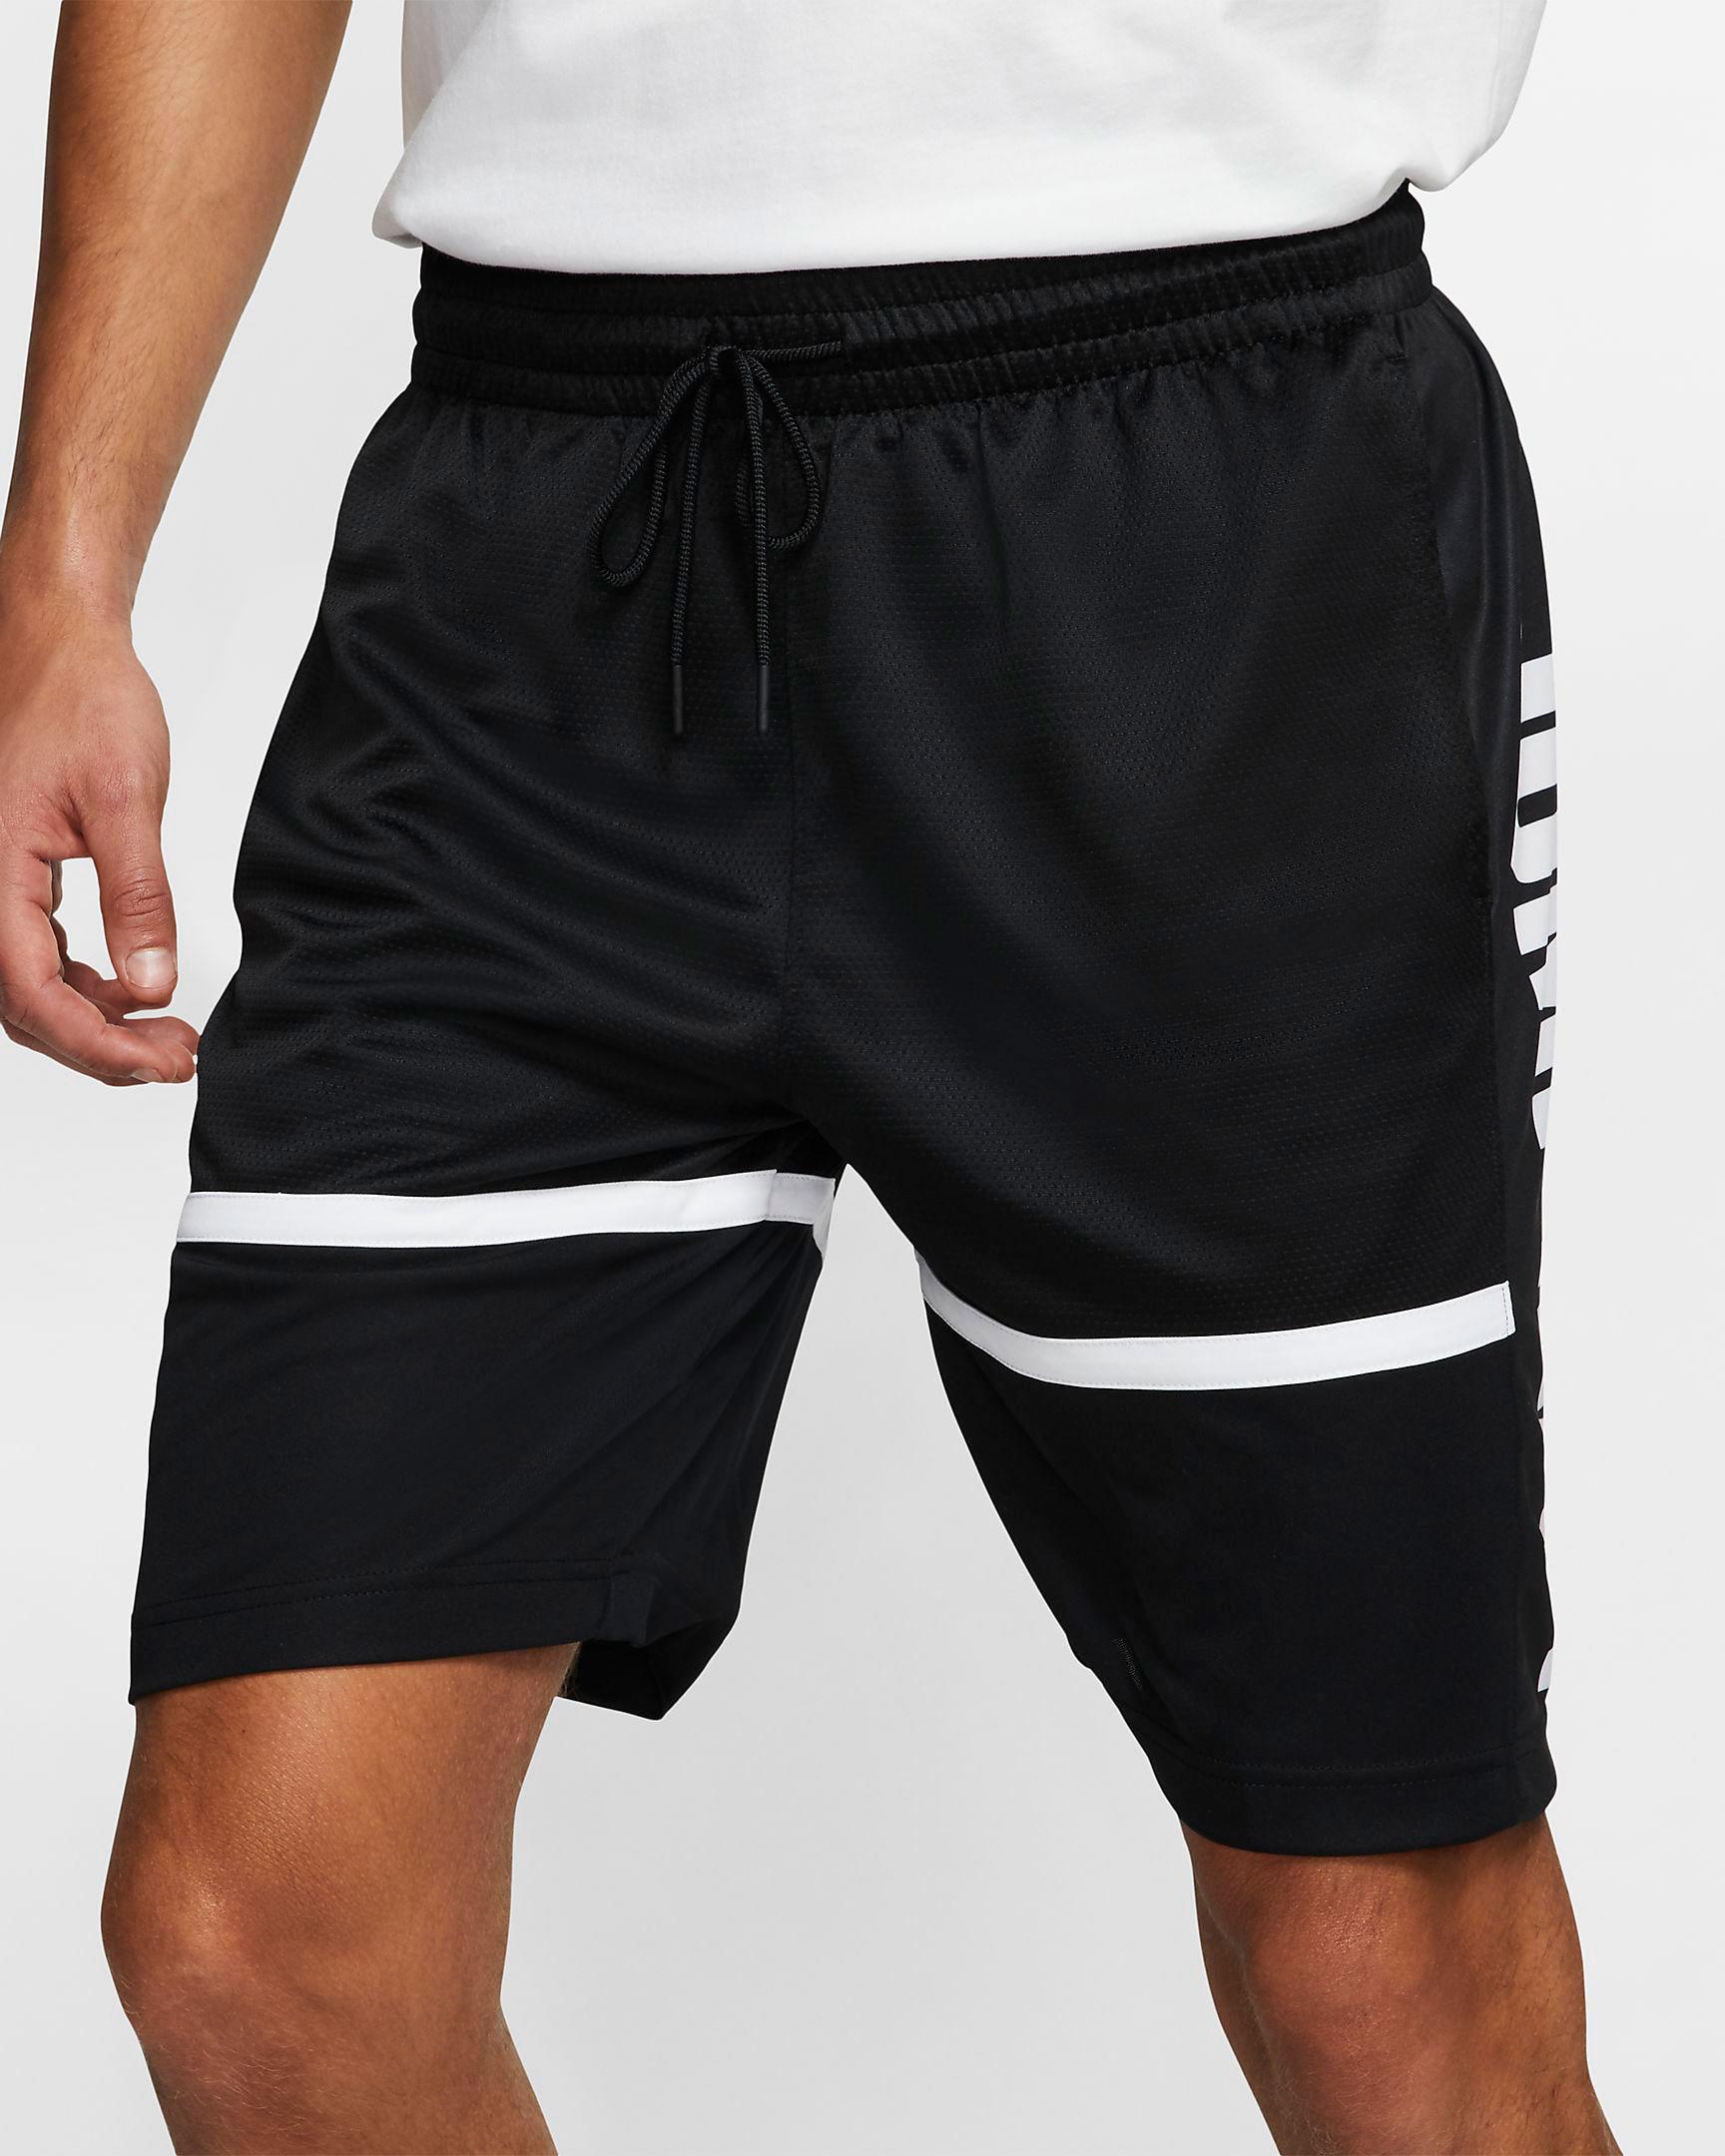 Jordan 11 Low Ie Space Jam Shorts To Match Sneakerfits Com